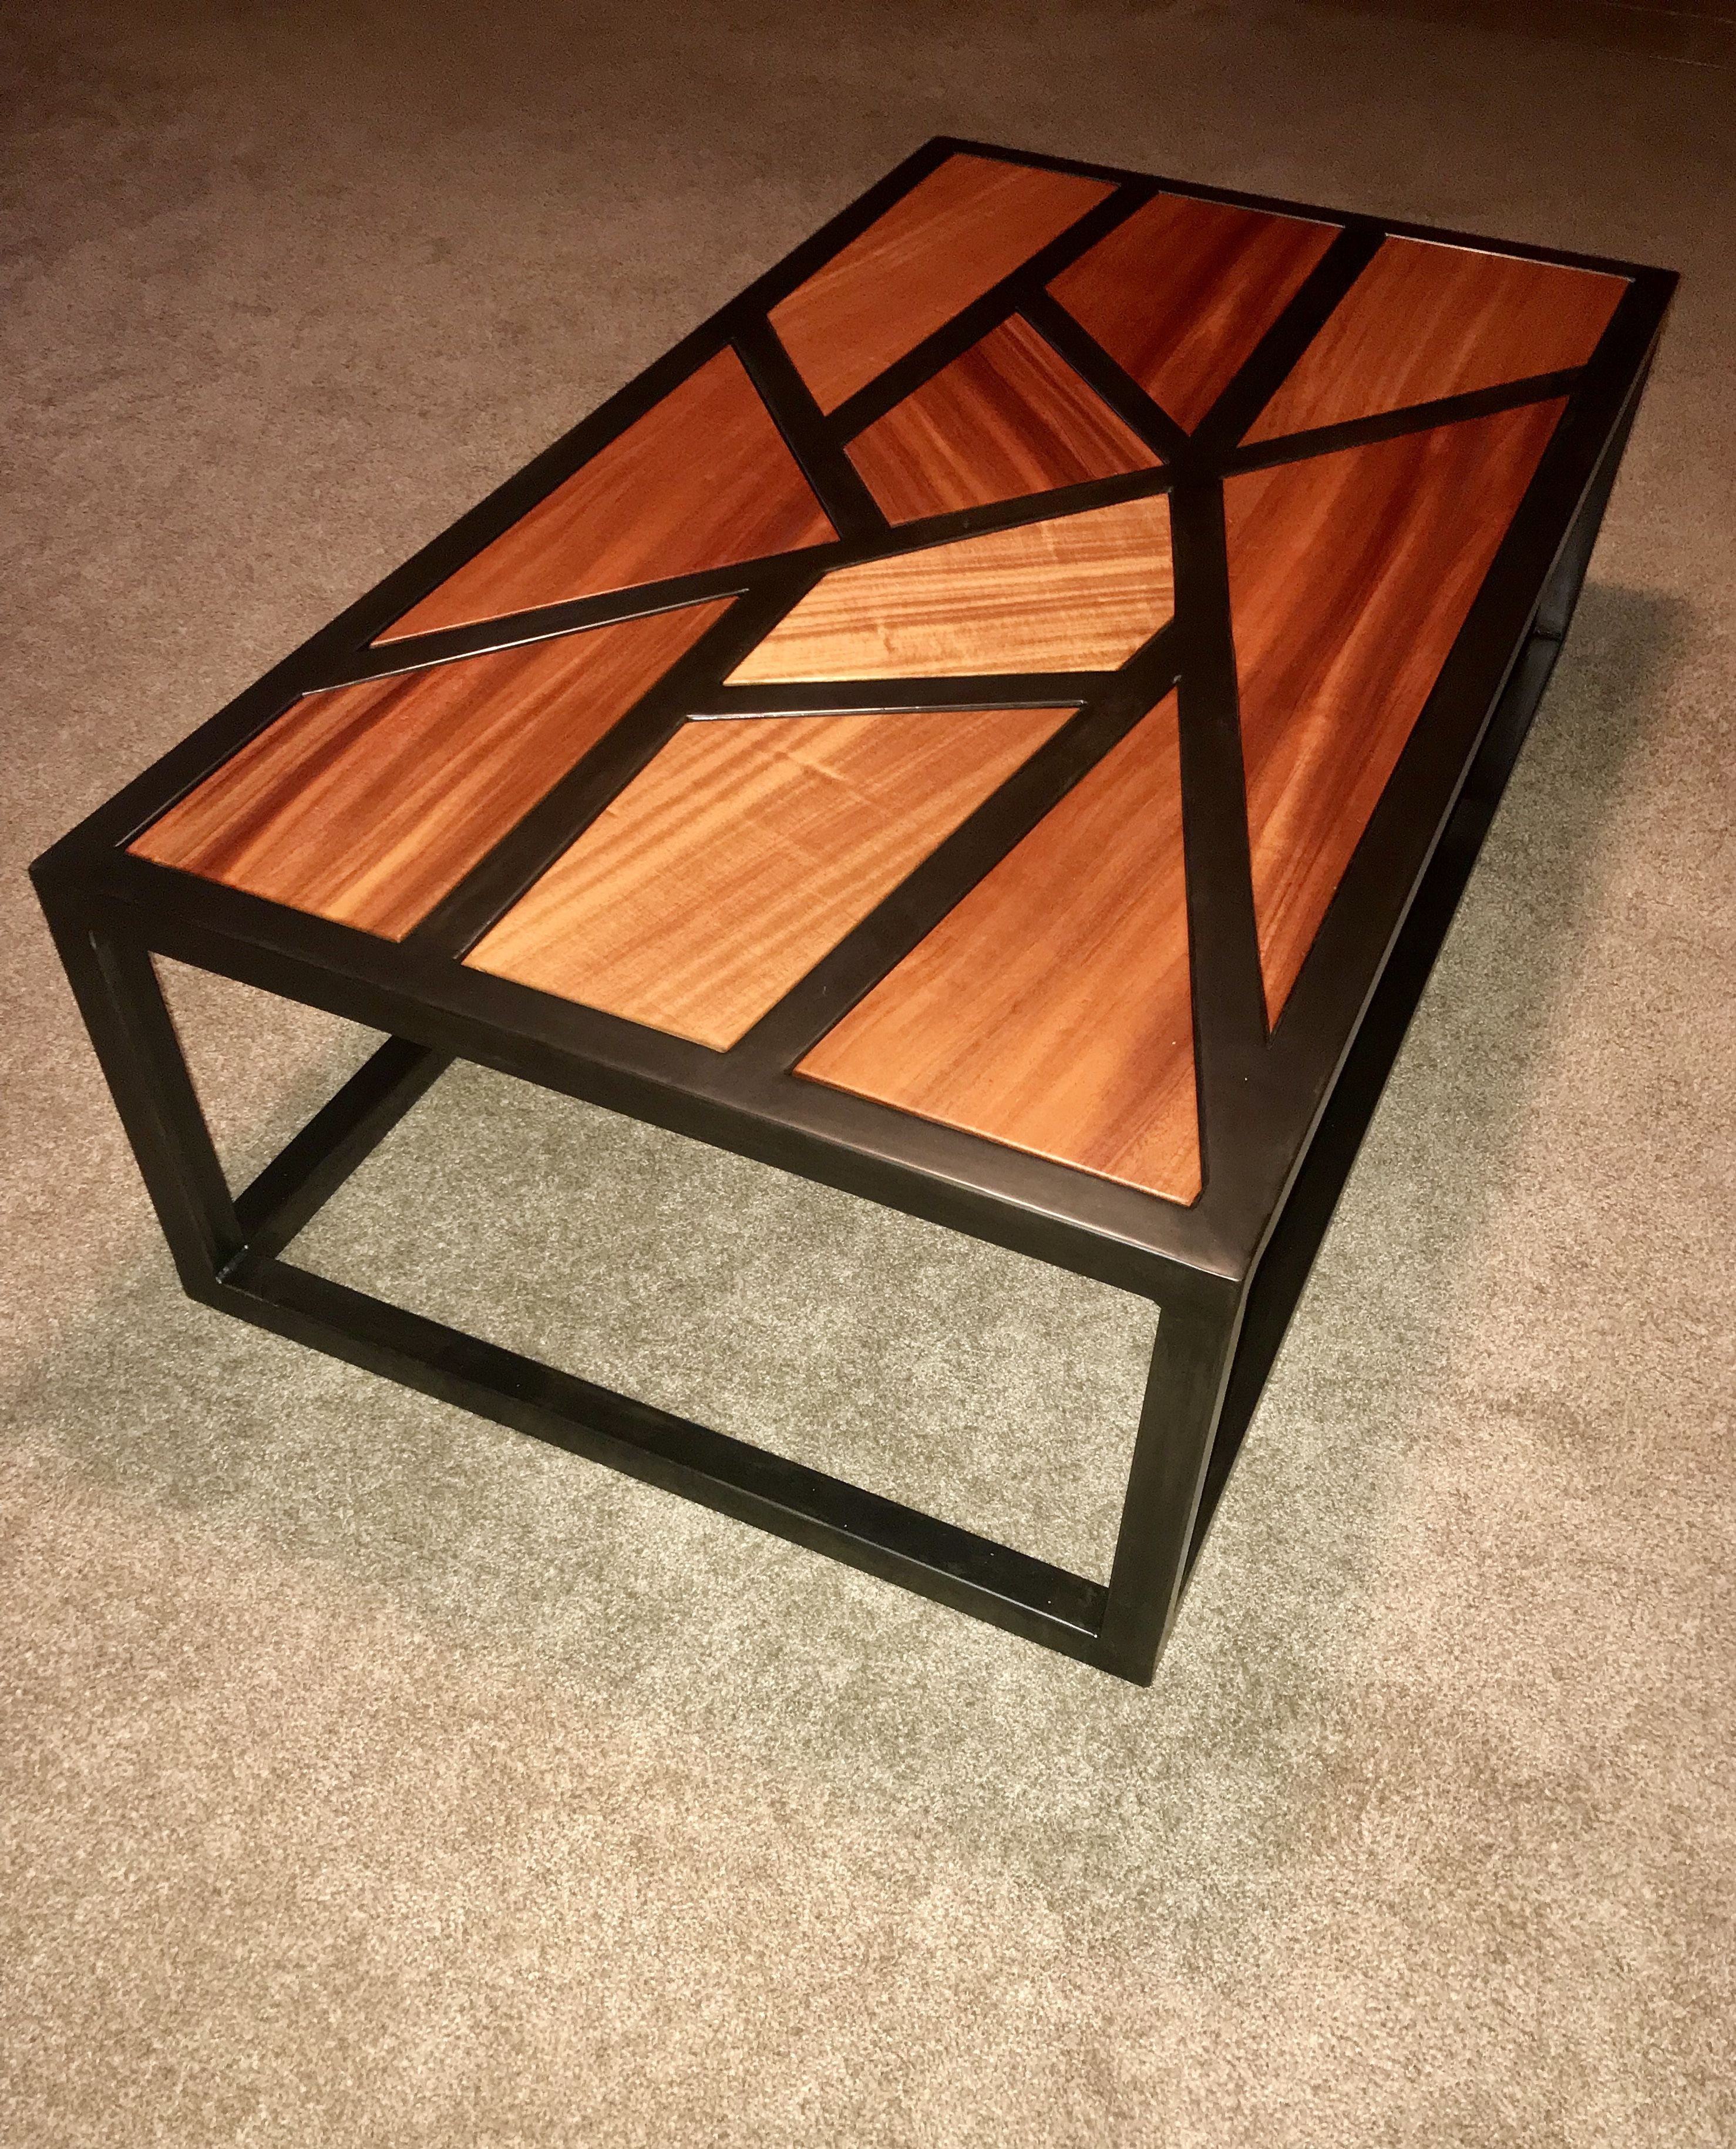 Steel Wood Coffee Table Metal Furniture Design Metal Work Table Metal Furniture [ 3659 x 2956 Pixel ]